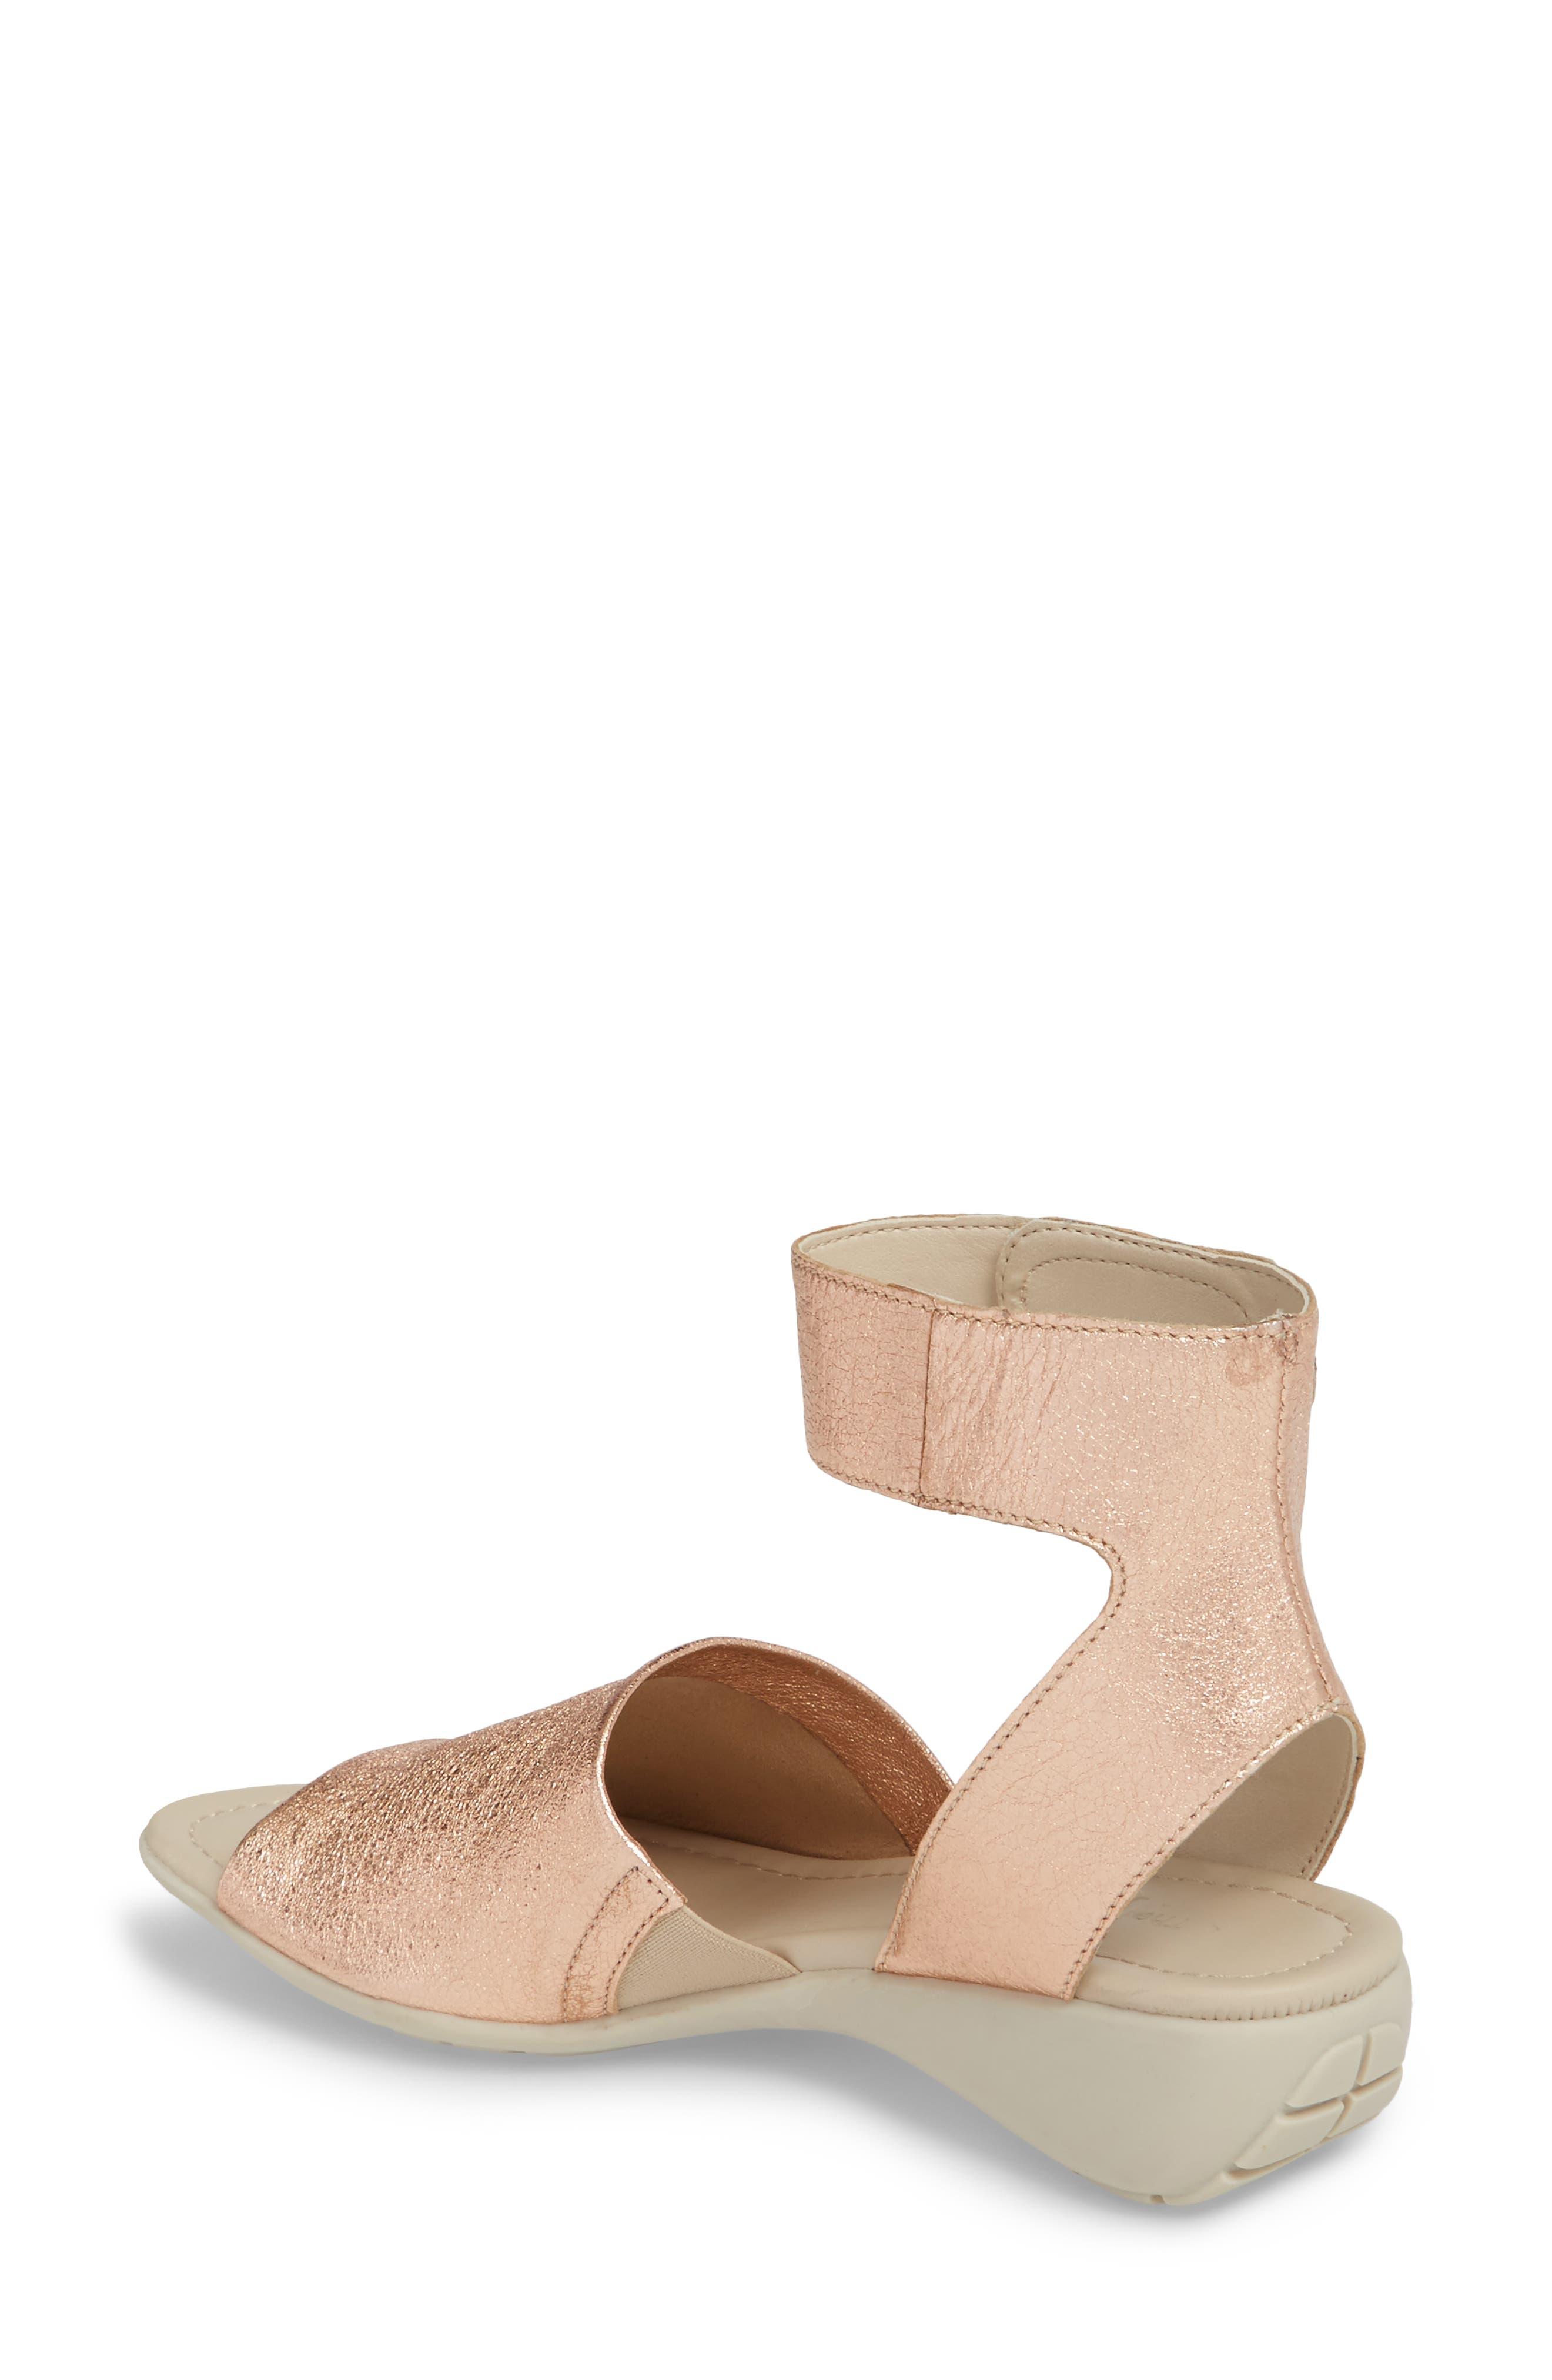 'Beglad' Leather Ankle Strap Sandal,                             Alternate thumbnail 20, color,